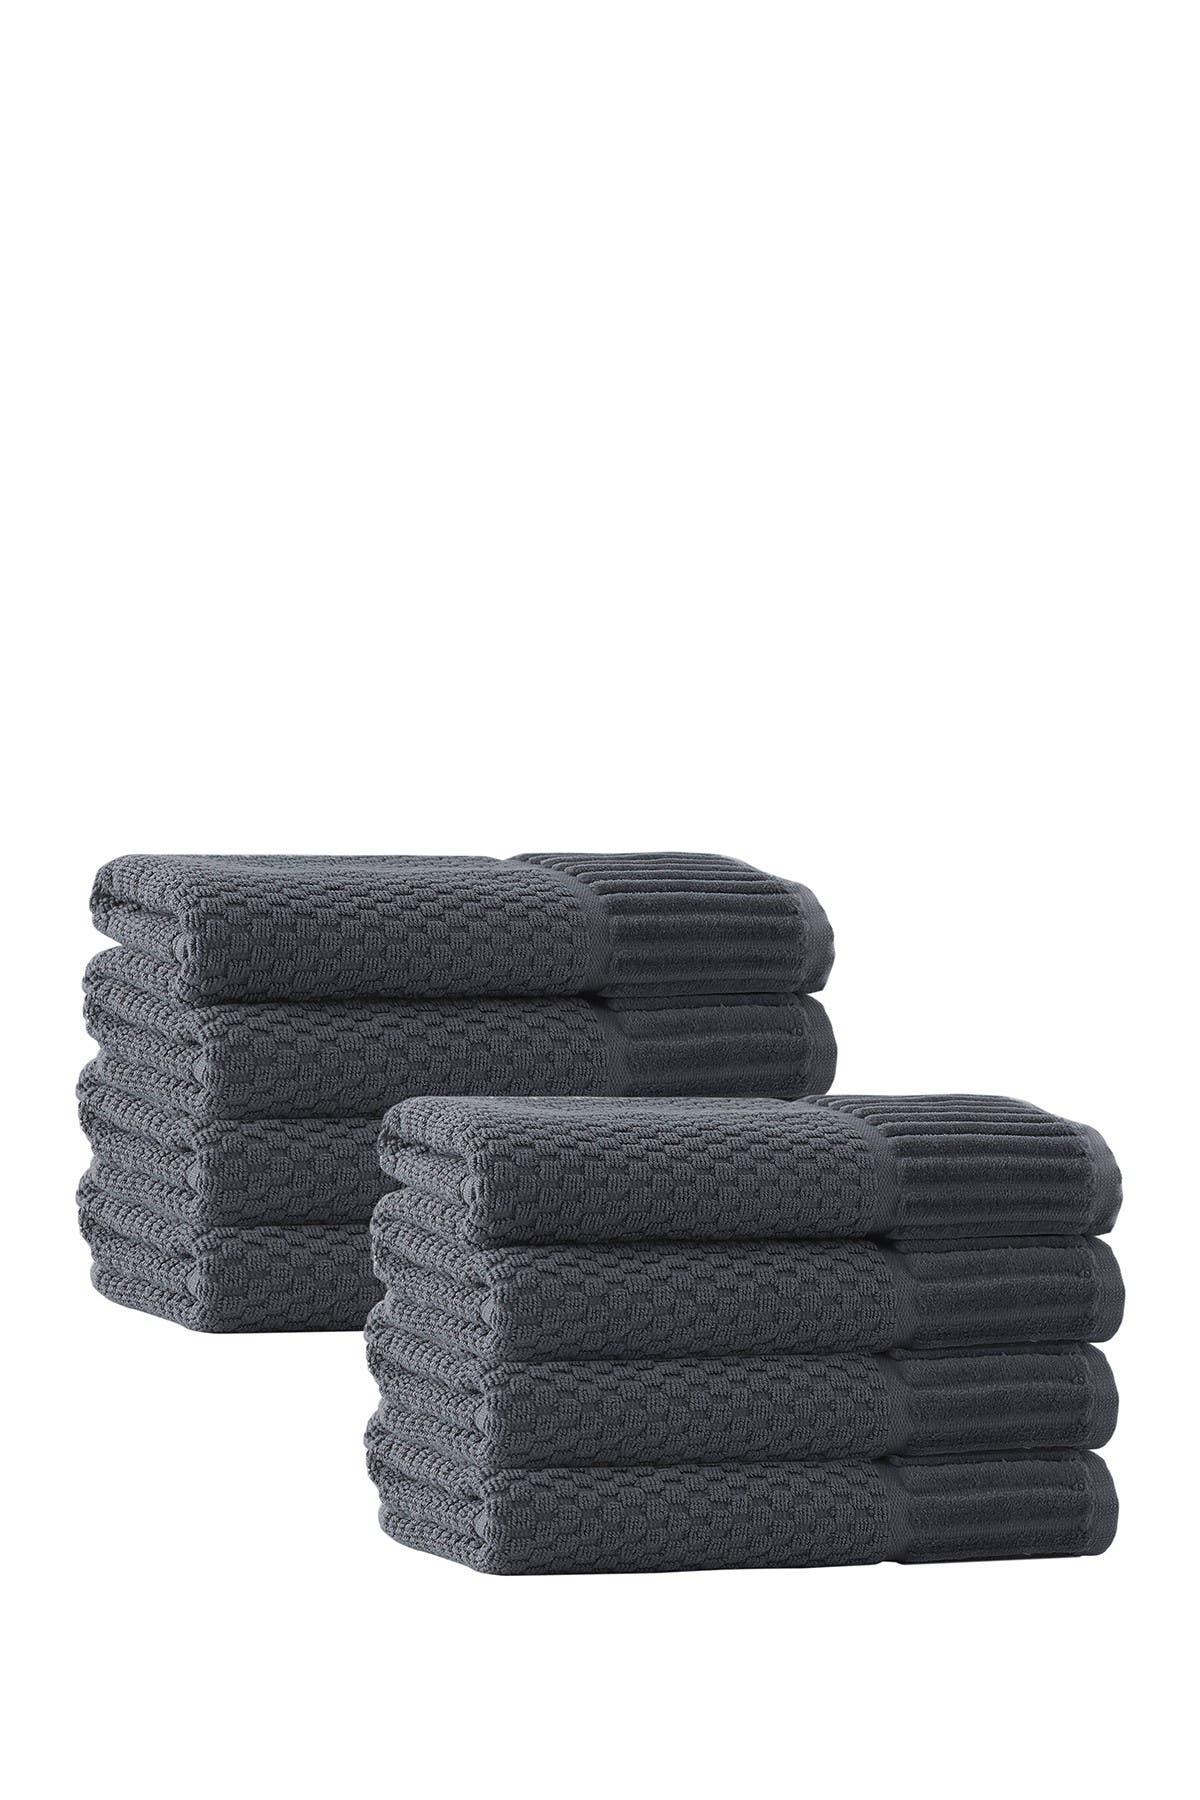 Image of ENCHANTE HOME Timaru Turkish Cotton Hand Towel - Anthracite - Set of 8